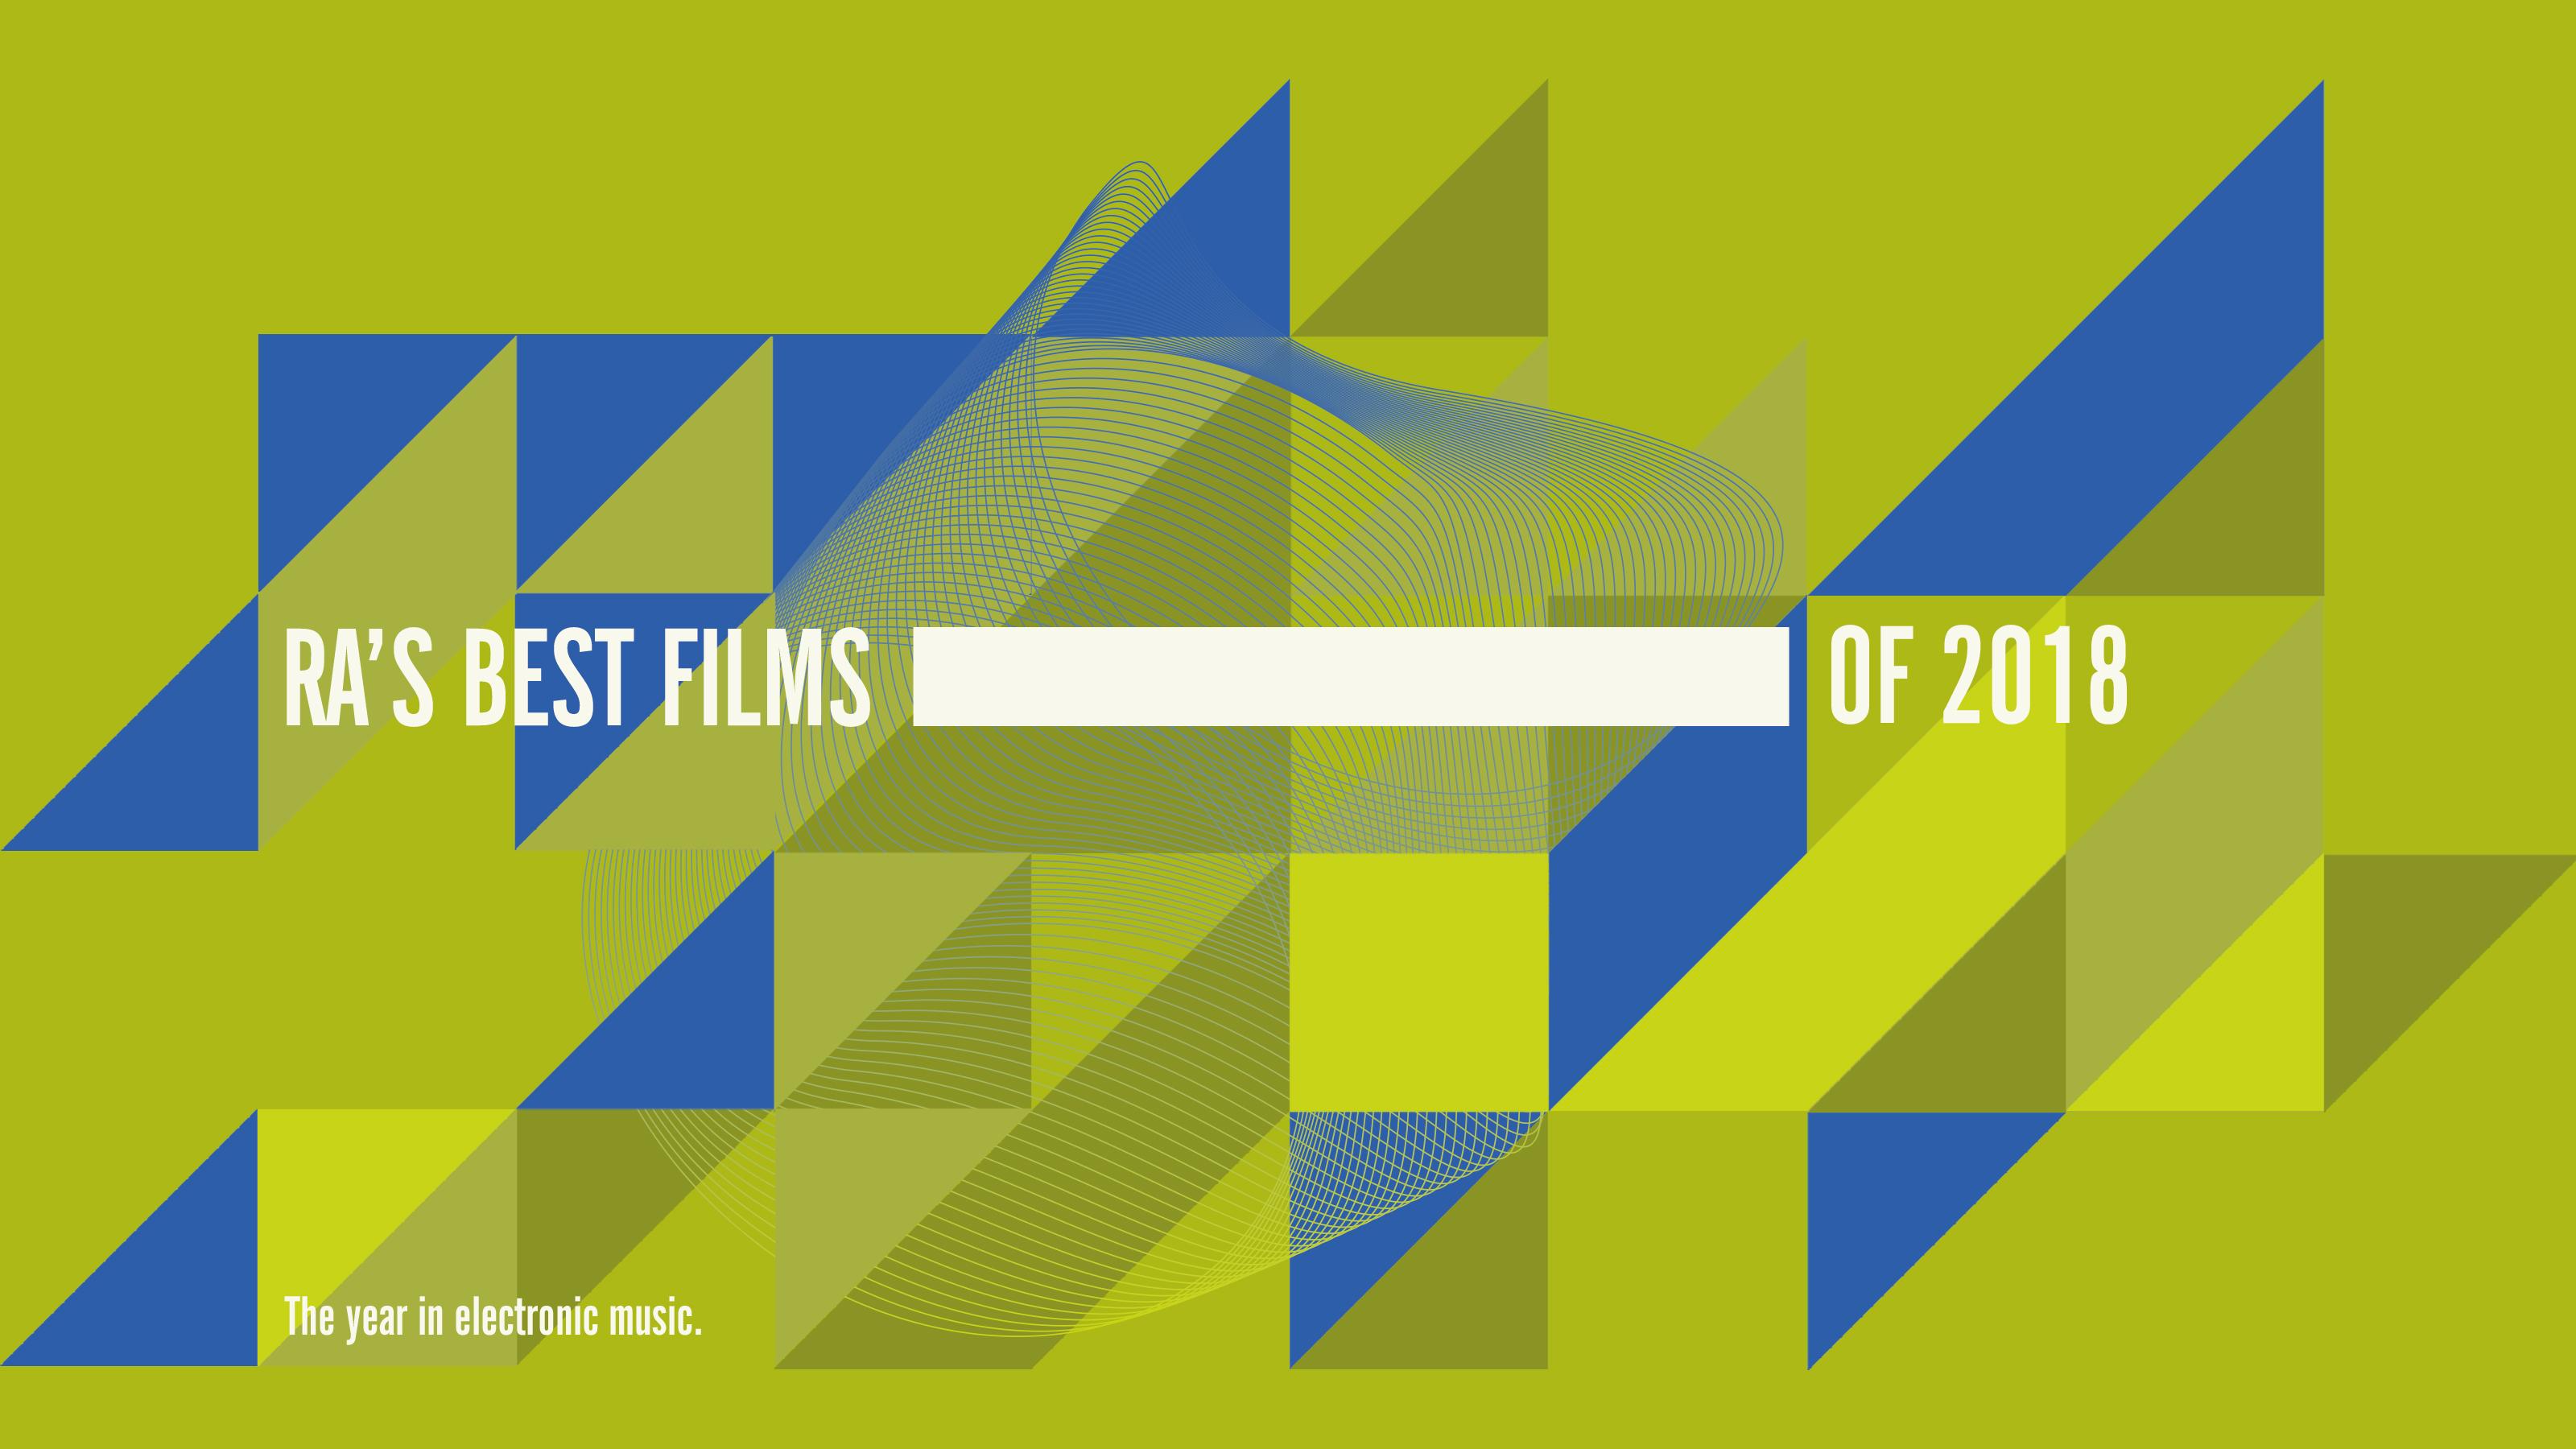 RA's best films of 2018